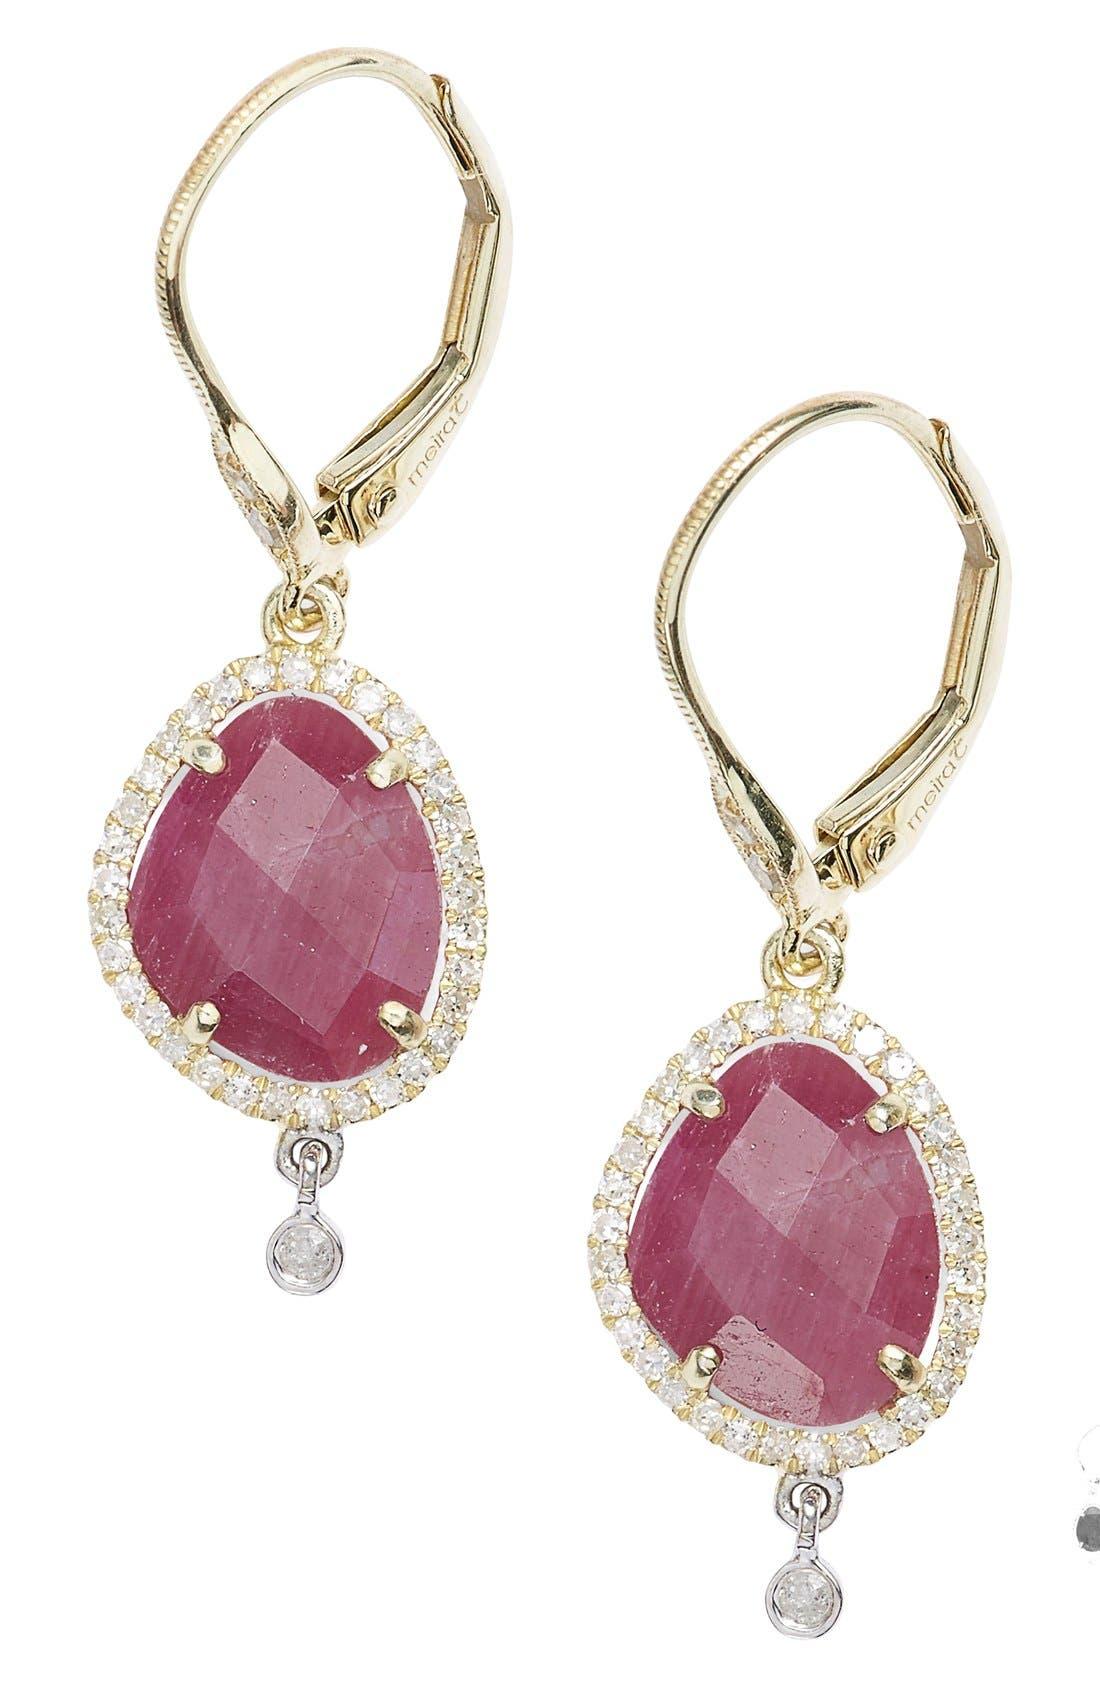 Meira T Diamond & Semiprecious Stone Drop Earrings